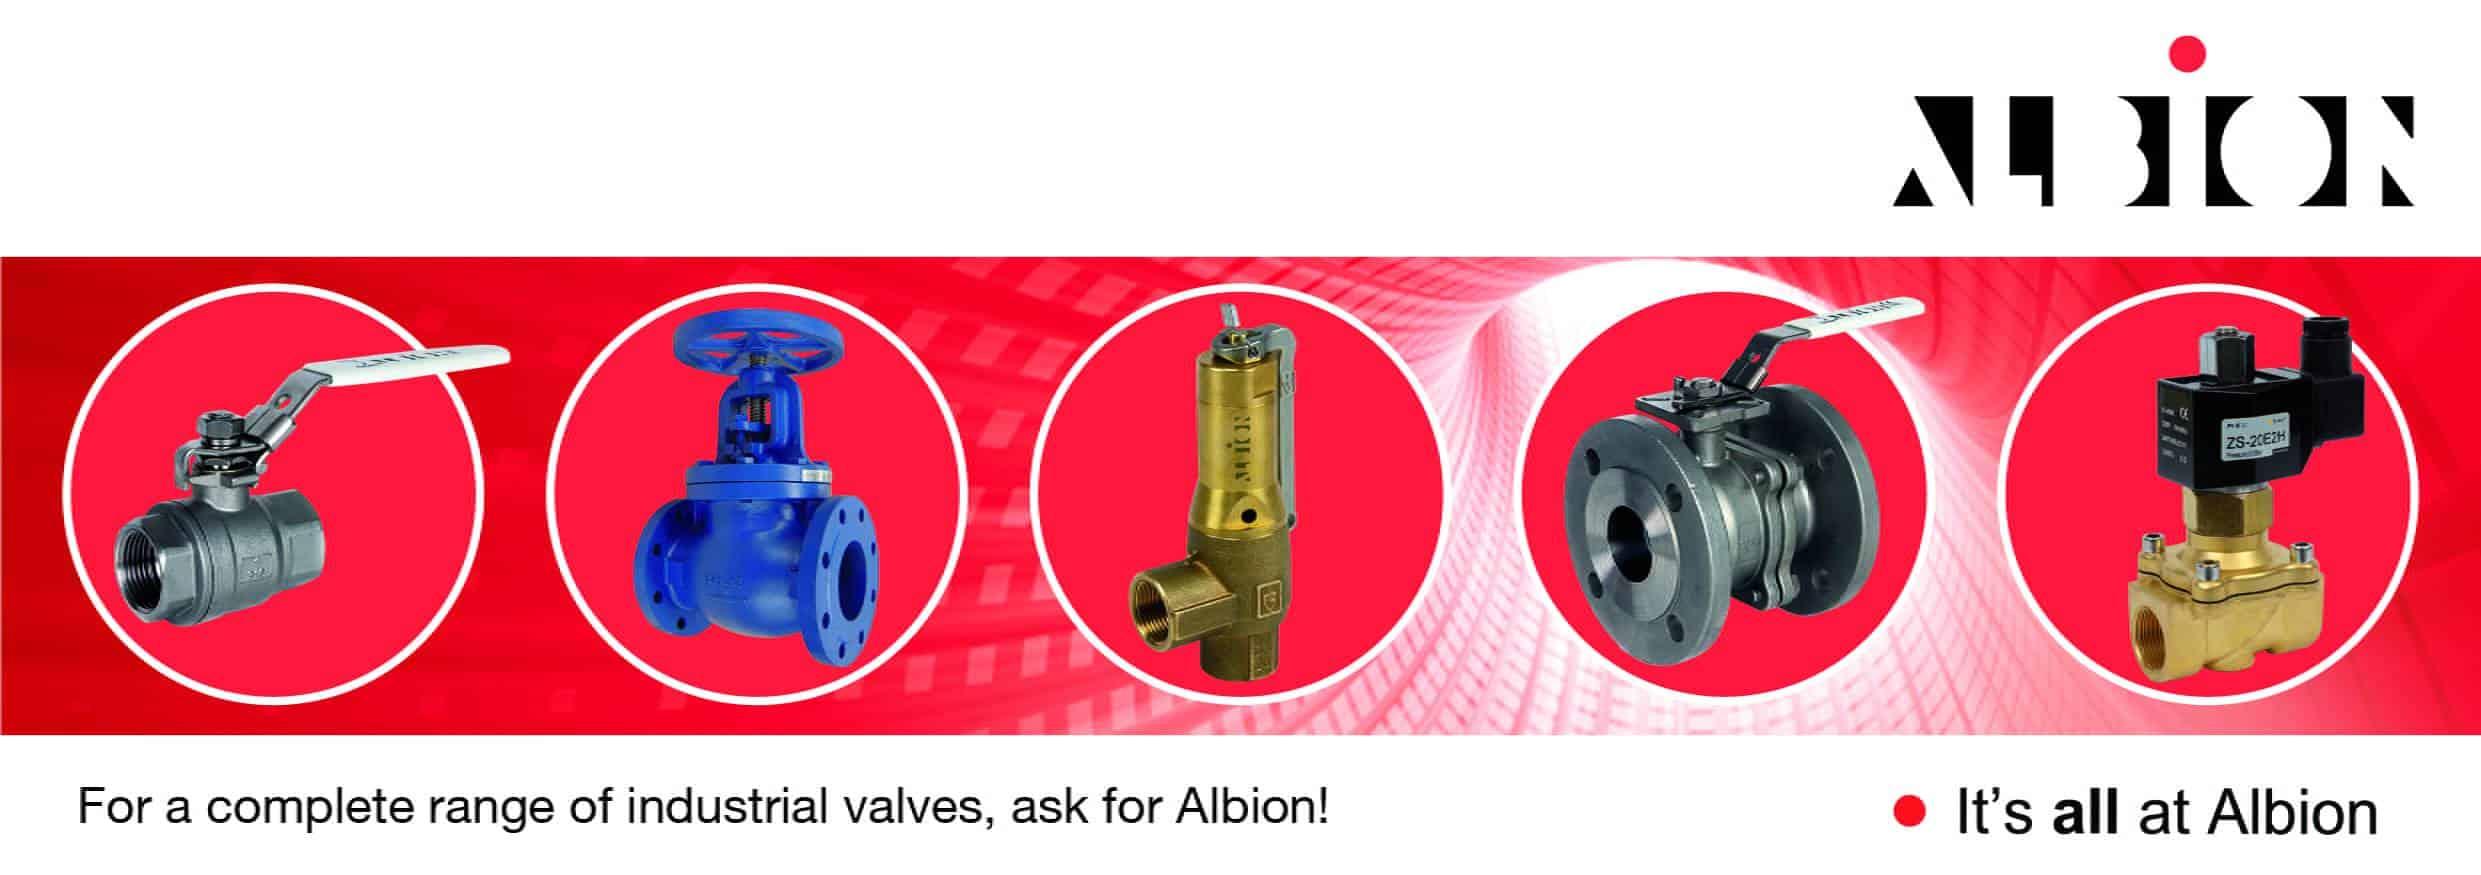 Albion Stock Image